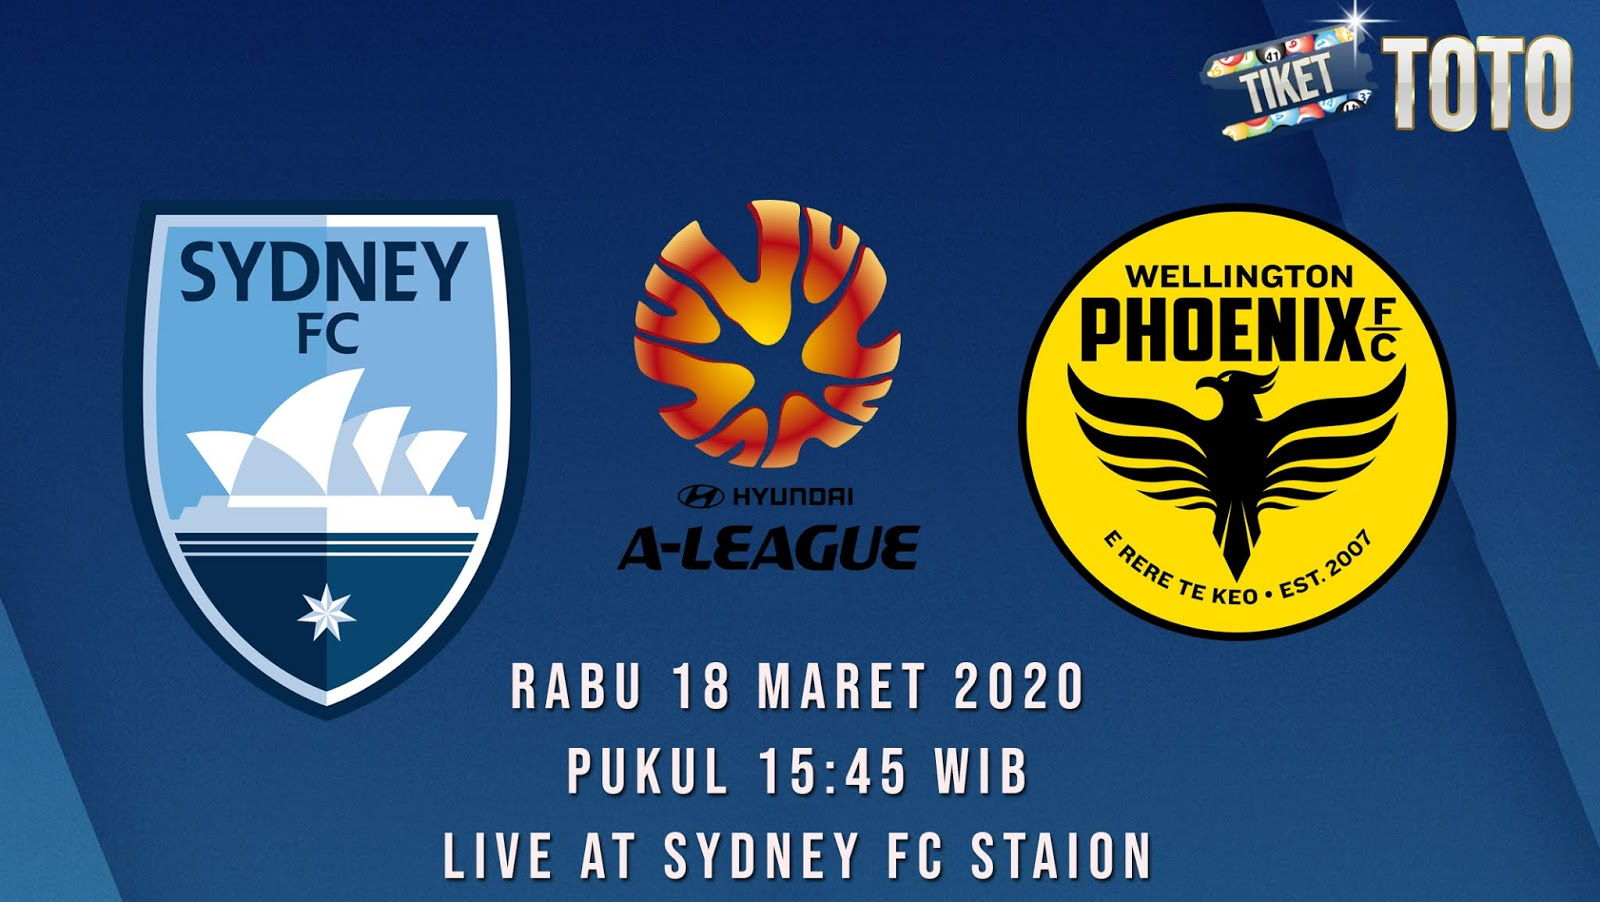 Prediksi Sydney FC vs Wellington Phoenix 18 Maret 2020